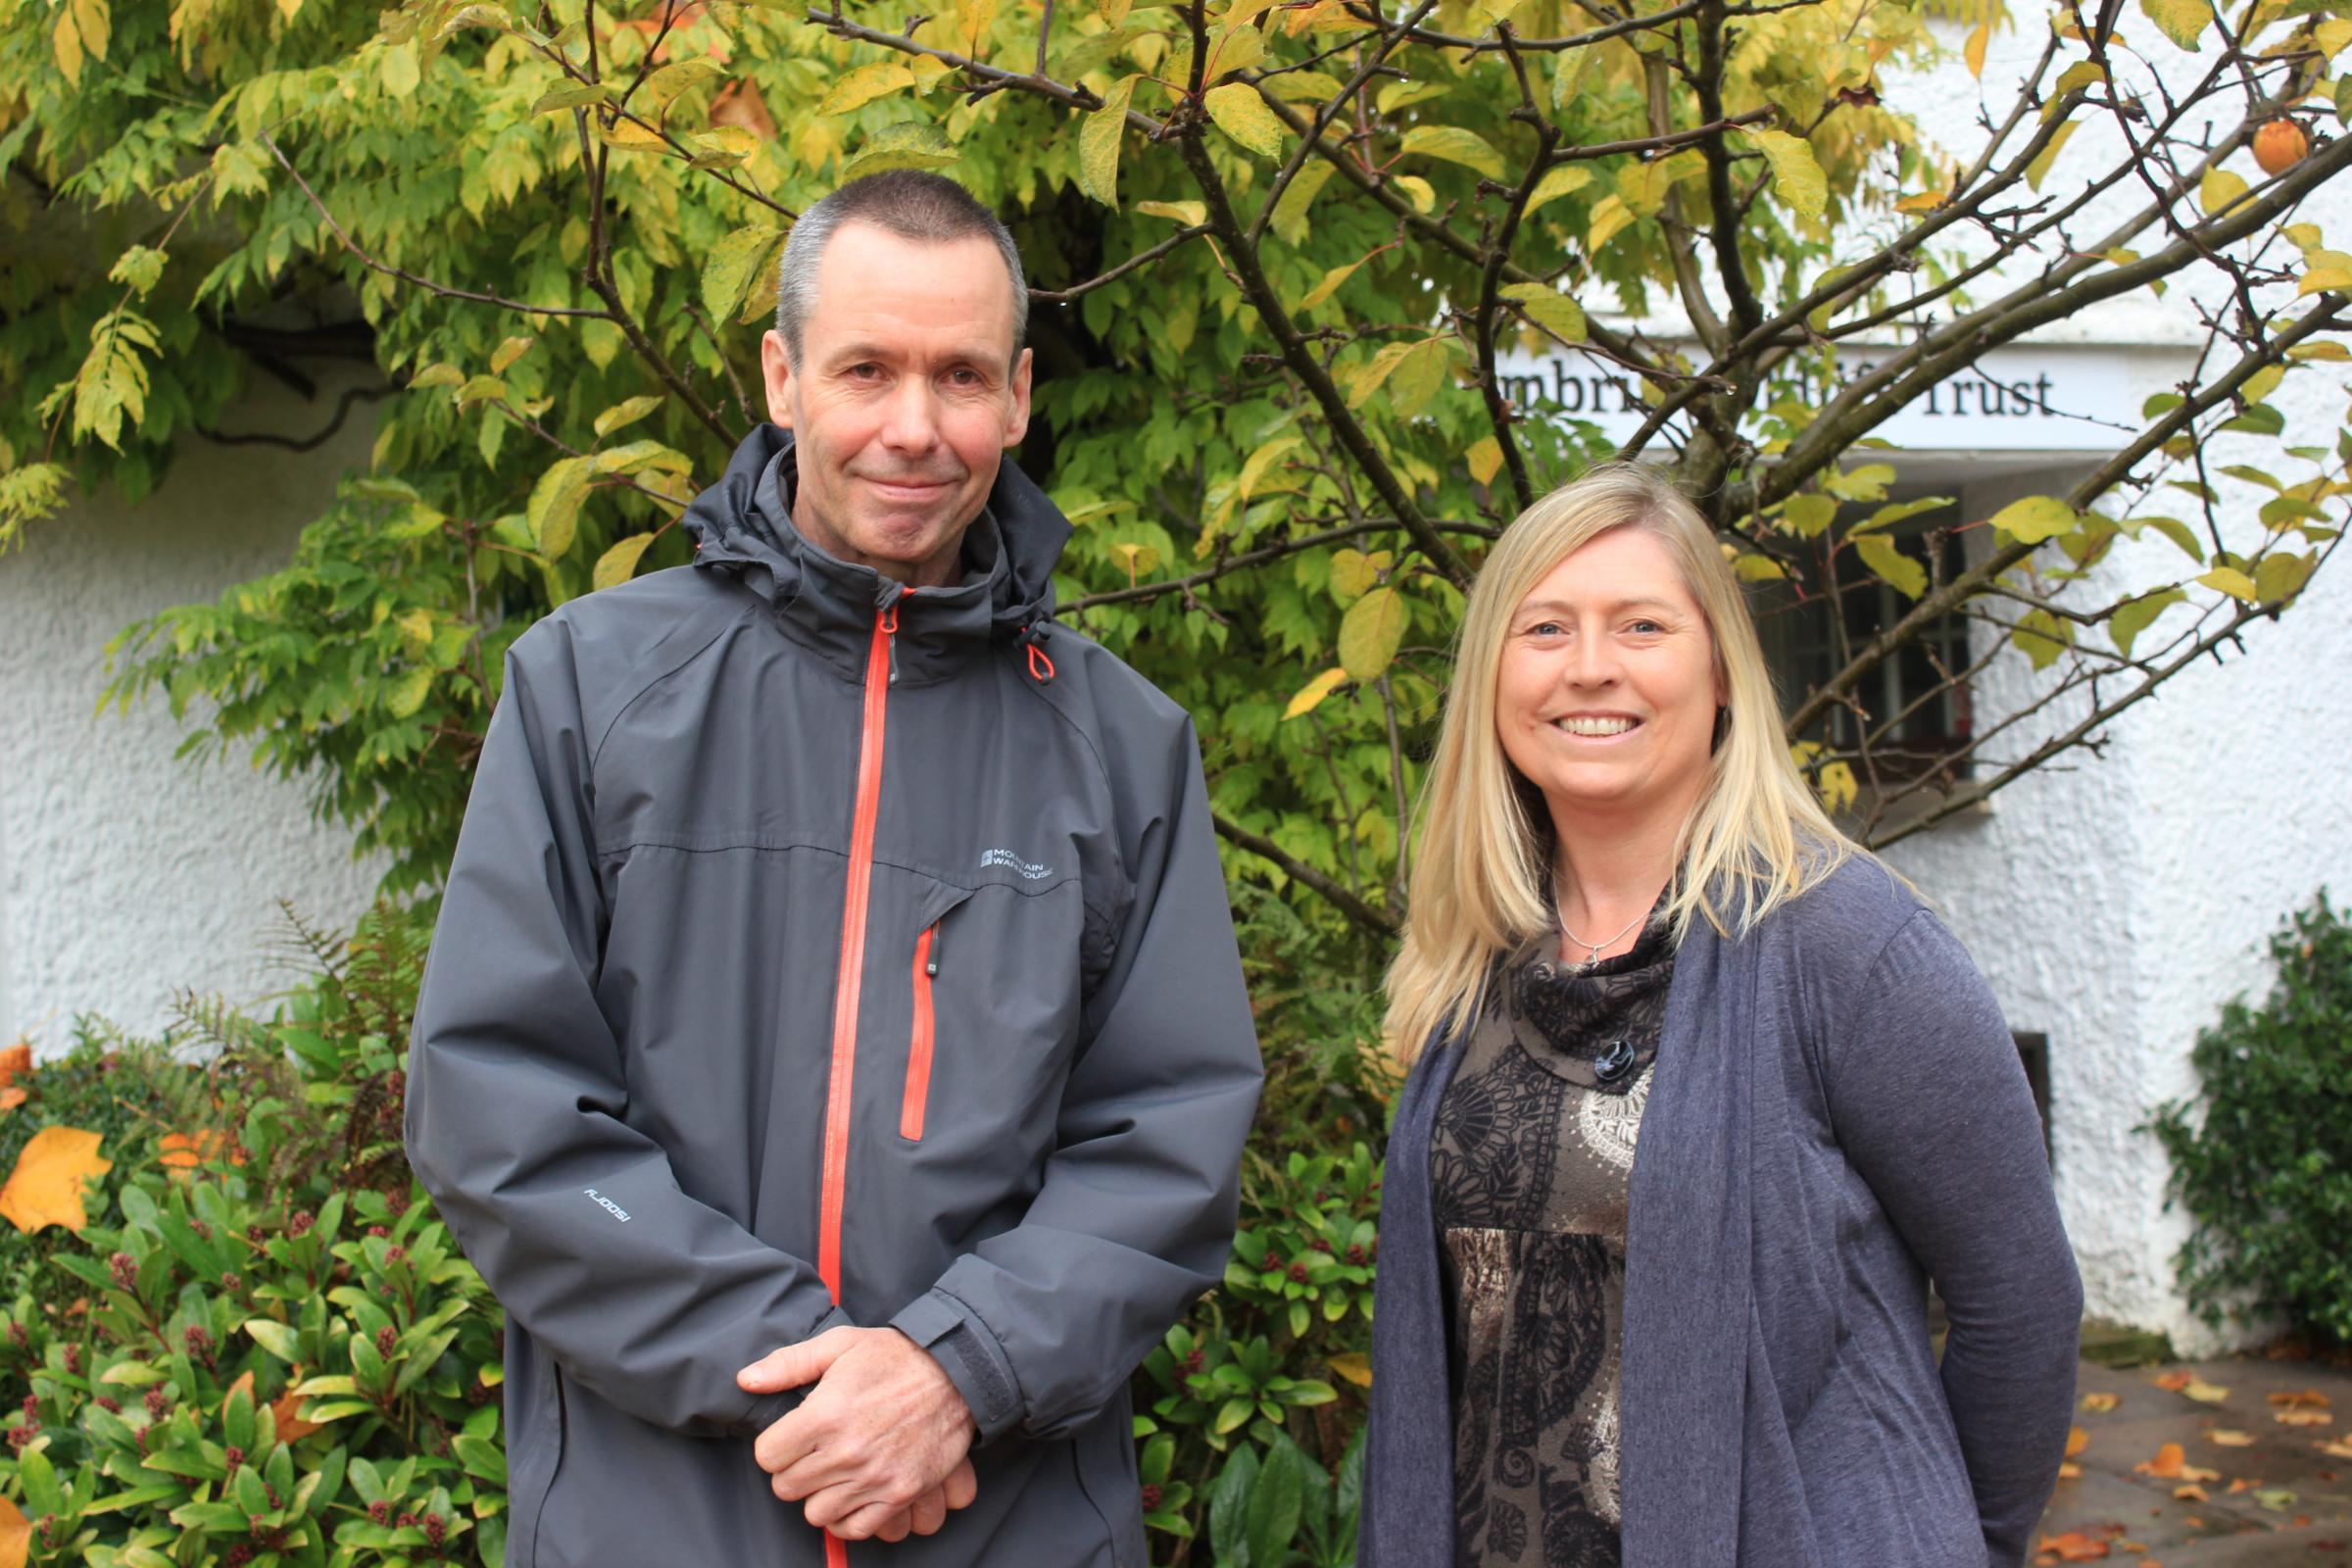 Gardener at Ryebeck Hotel presents donation to Cumbria Wildlife Trust